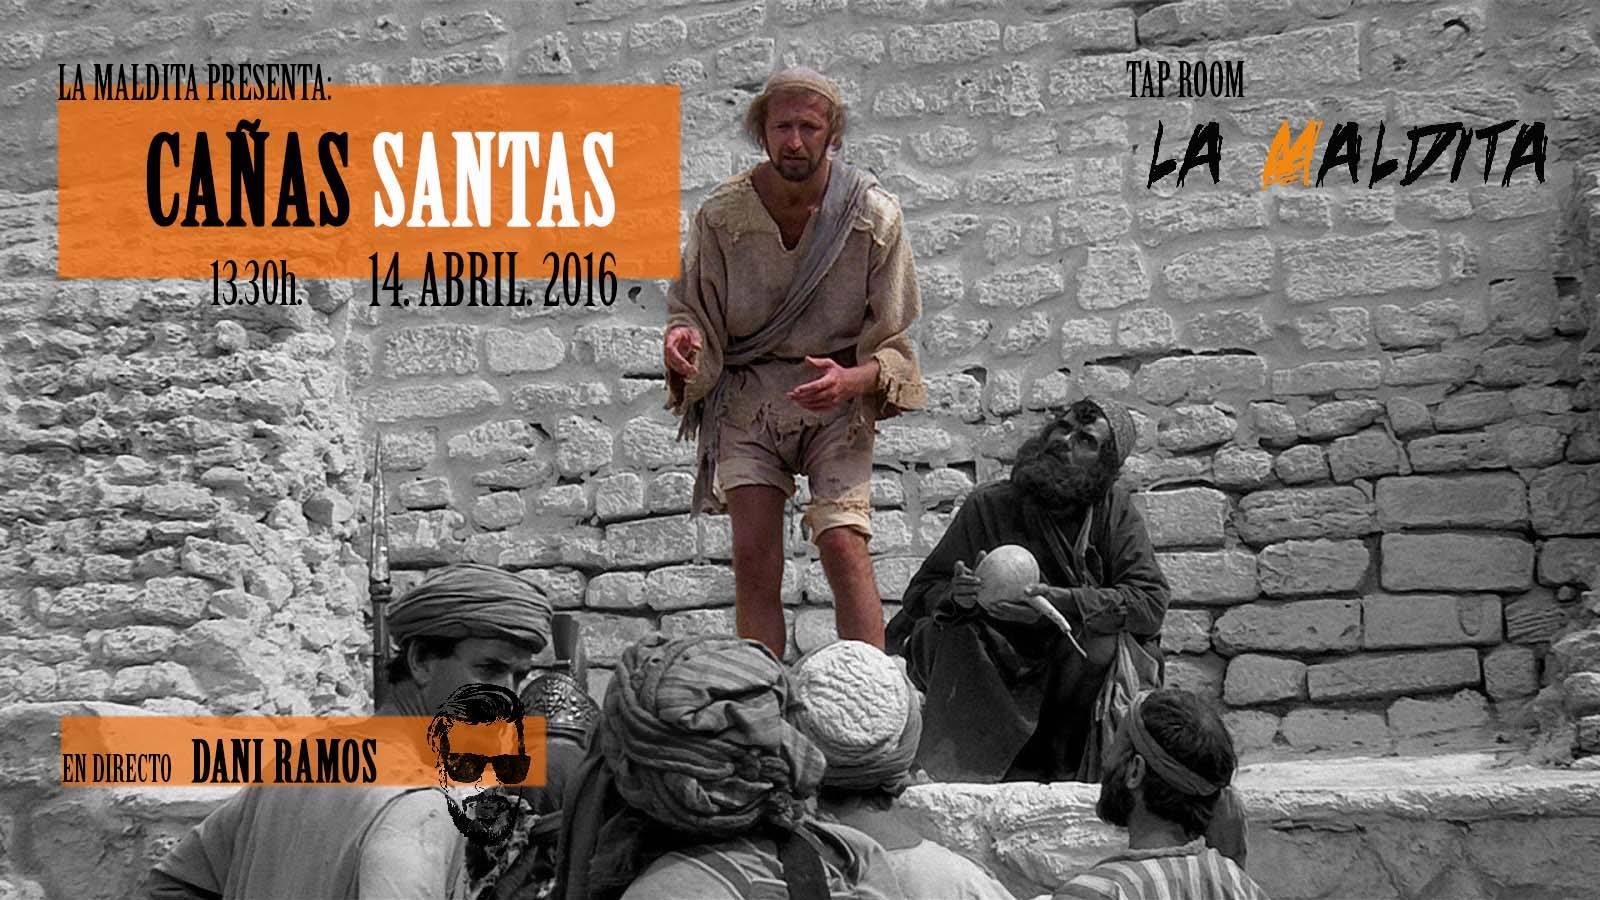 la maldita canas santas 2017 - La Maldita celebra las cañas Santas 2017 con música en vivo